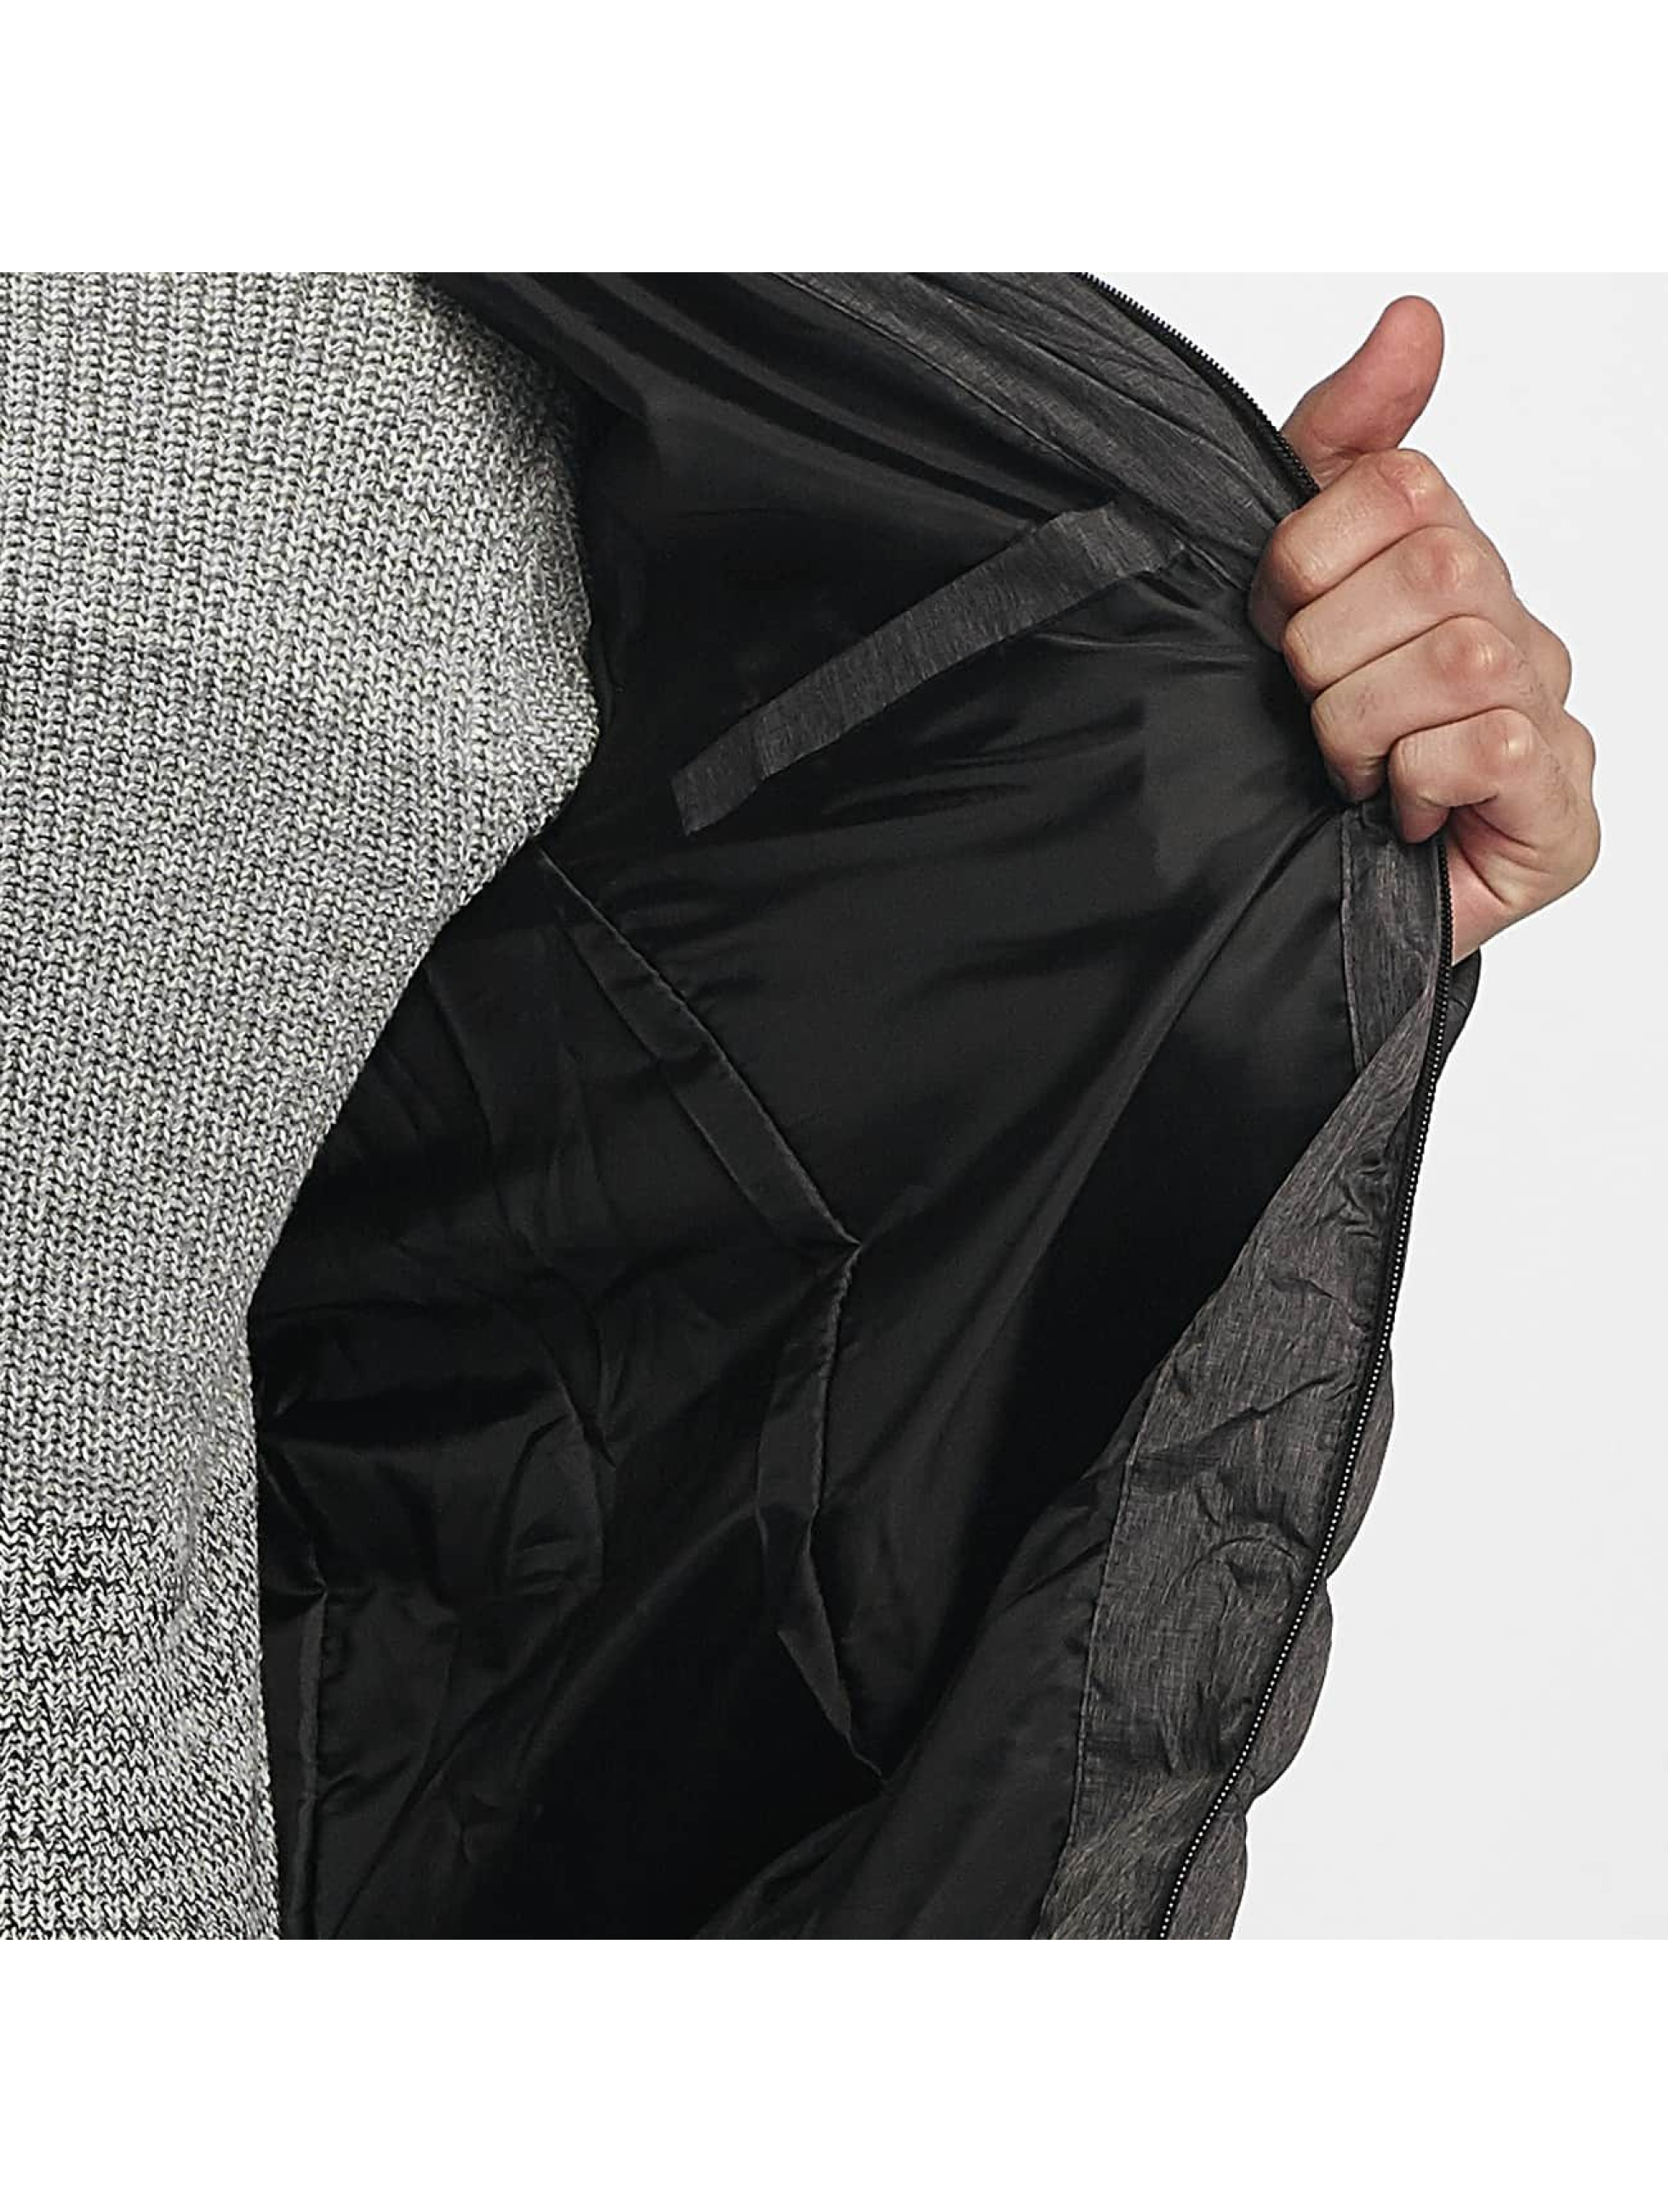 Brave Soul Winter Jacket Puffer grey